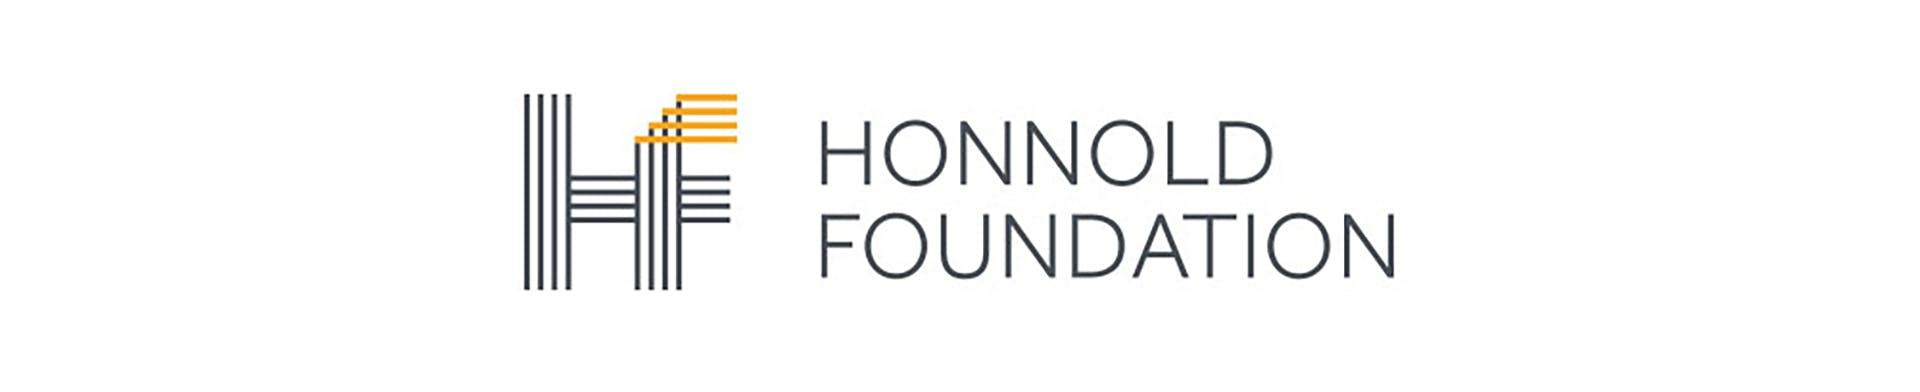 Honnold foundation logo